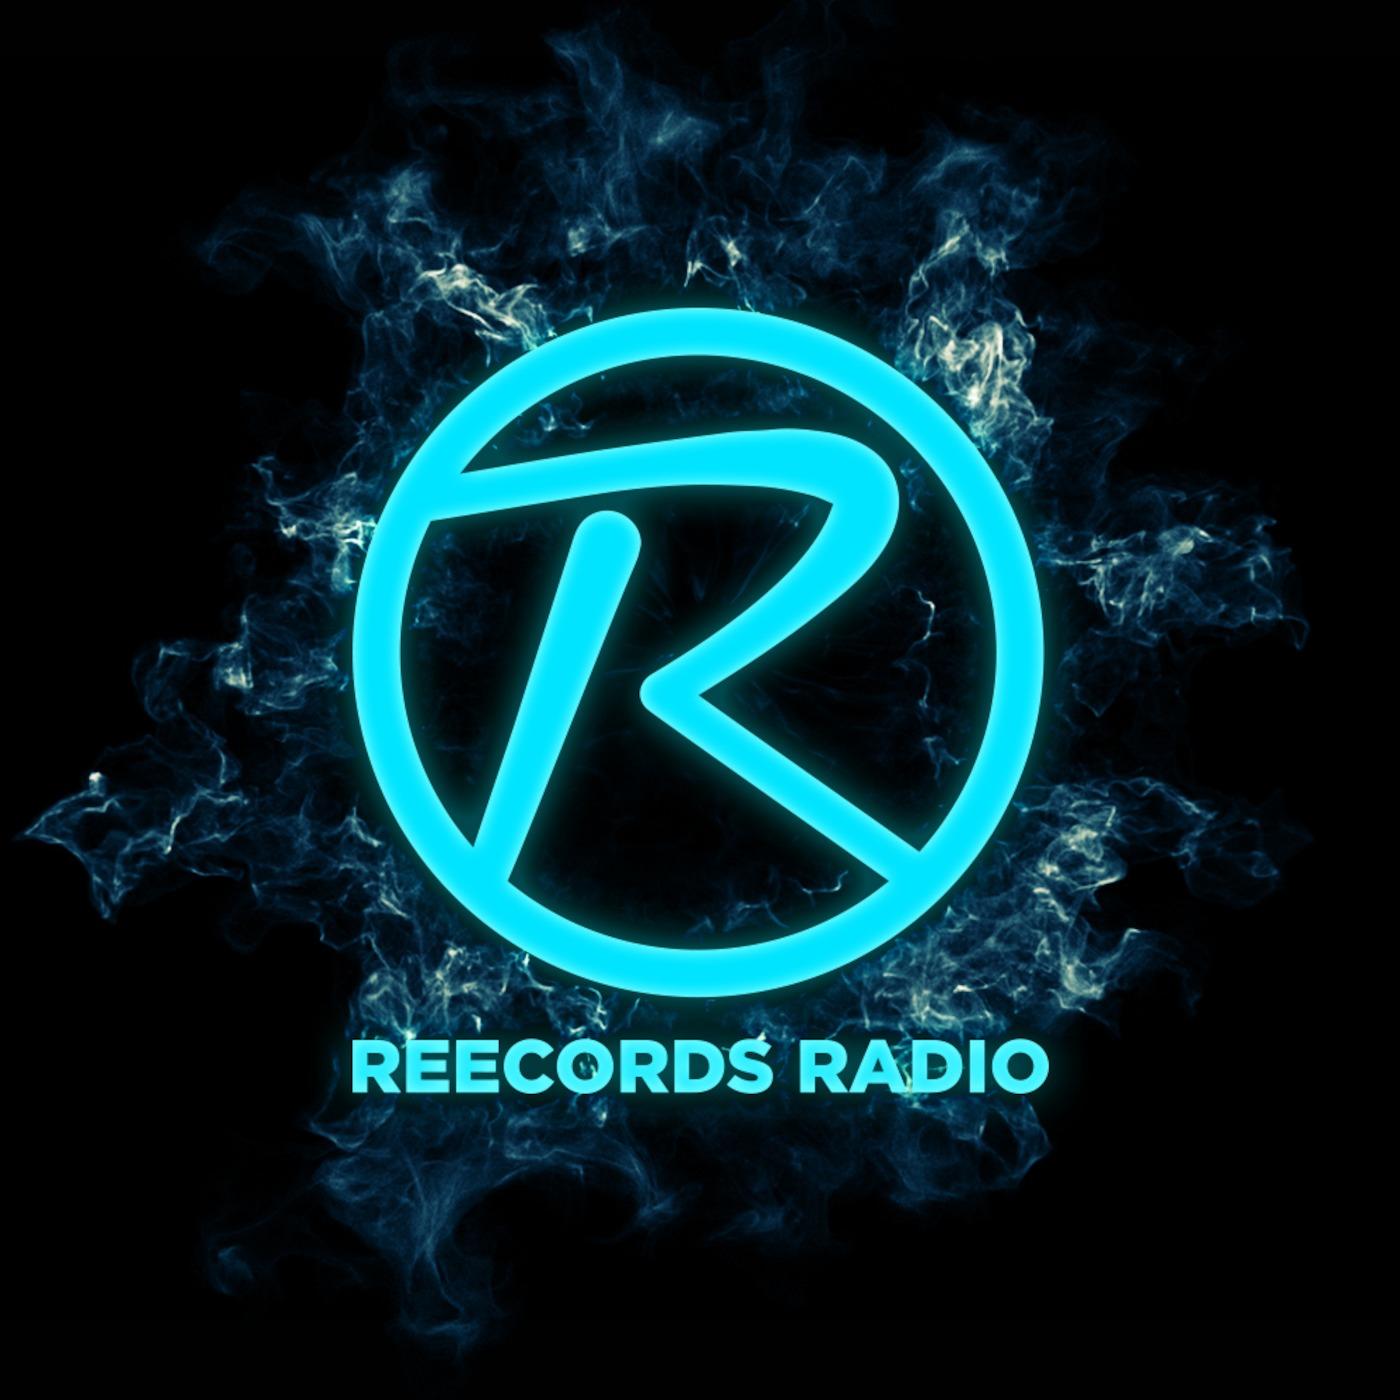 Norman Doray presents Reecords Radio